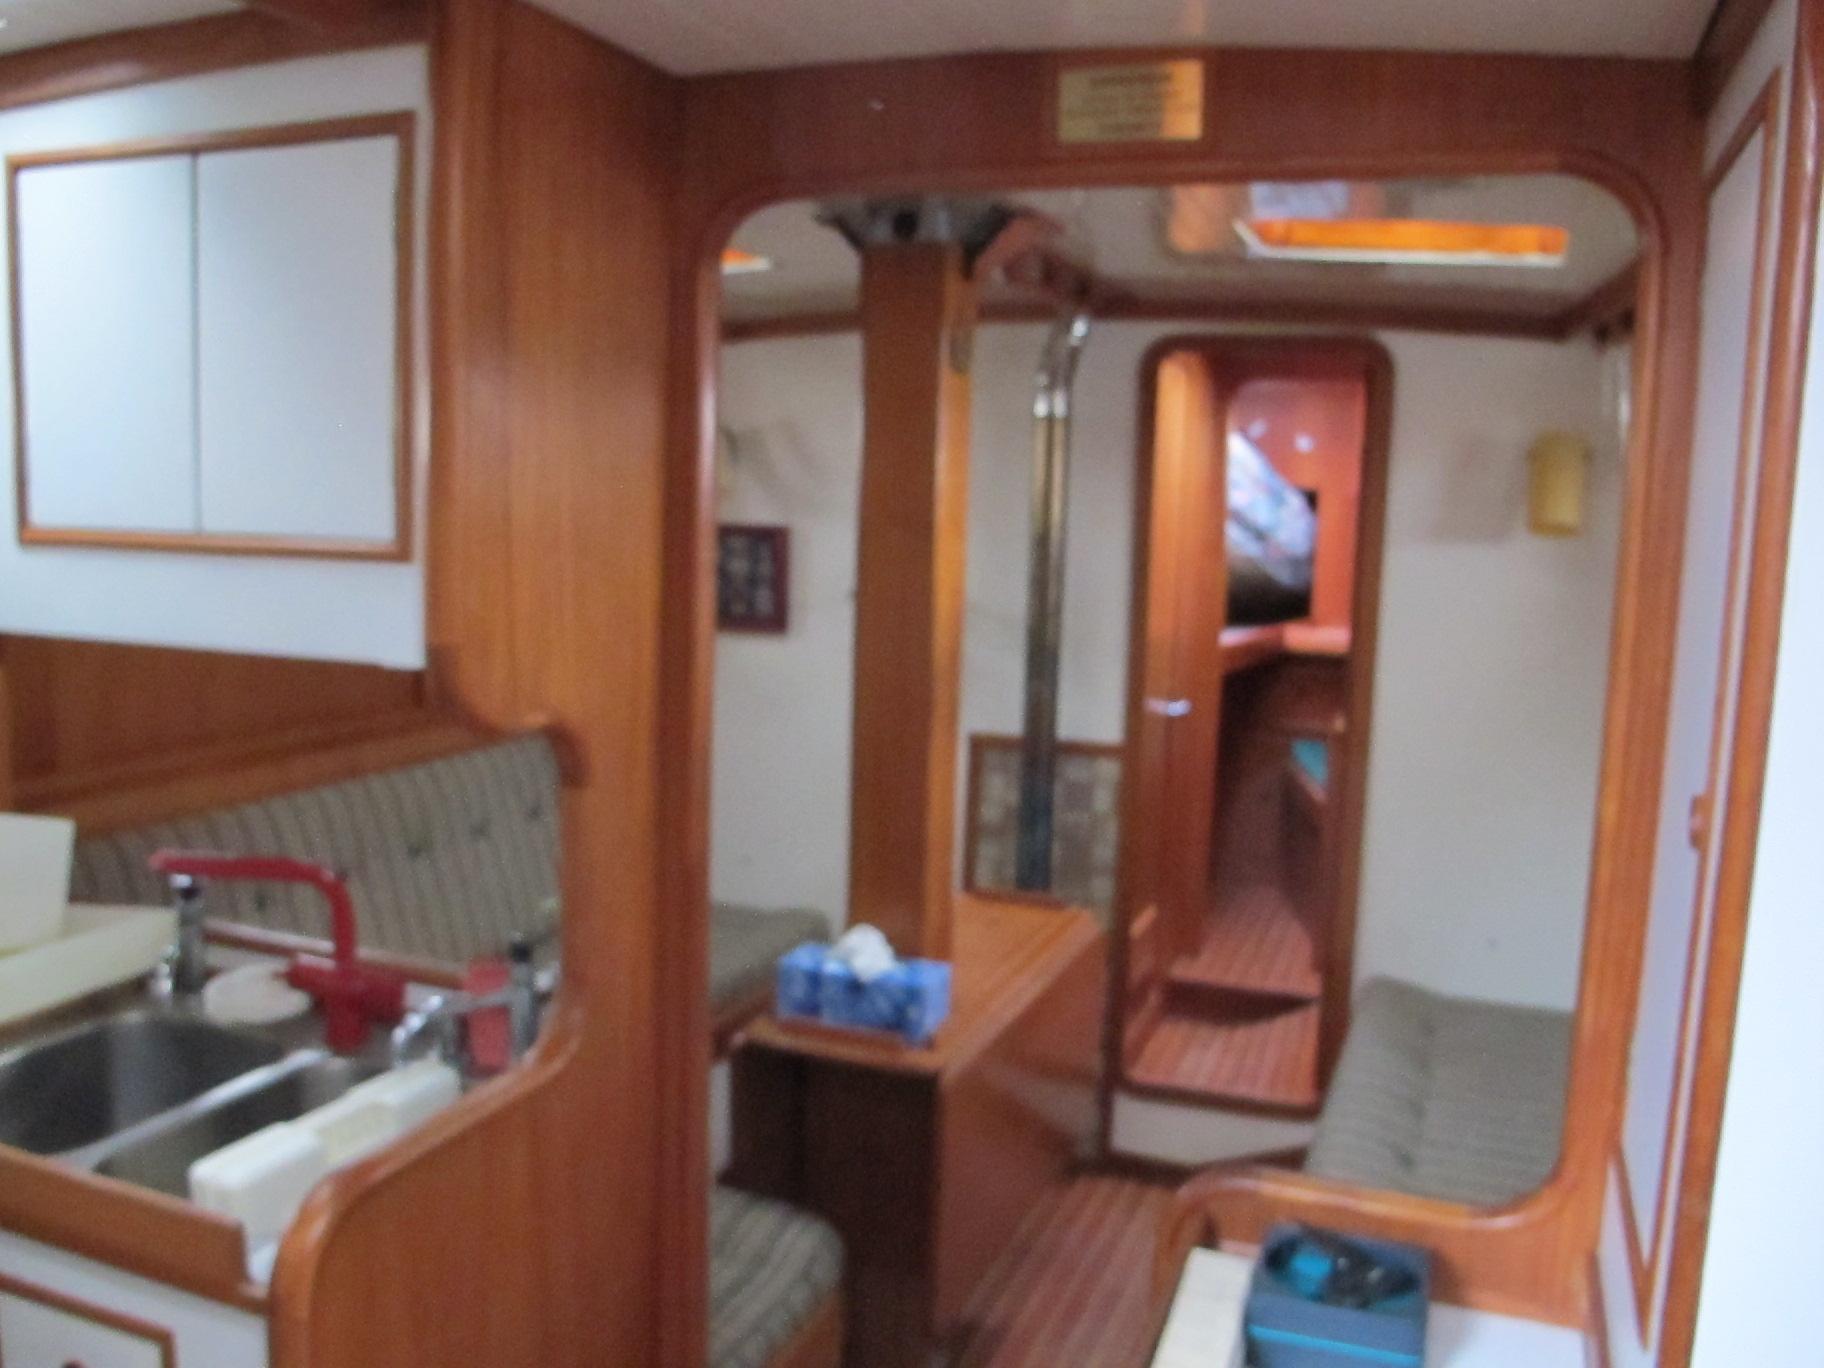 023 - Simmerdim - saloon